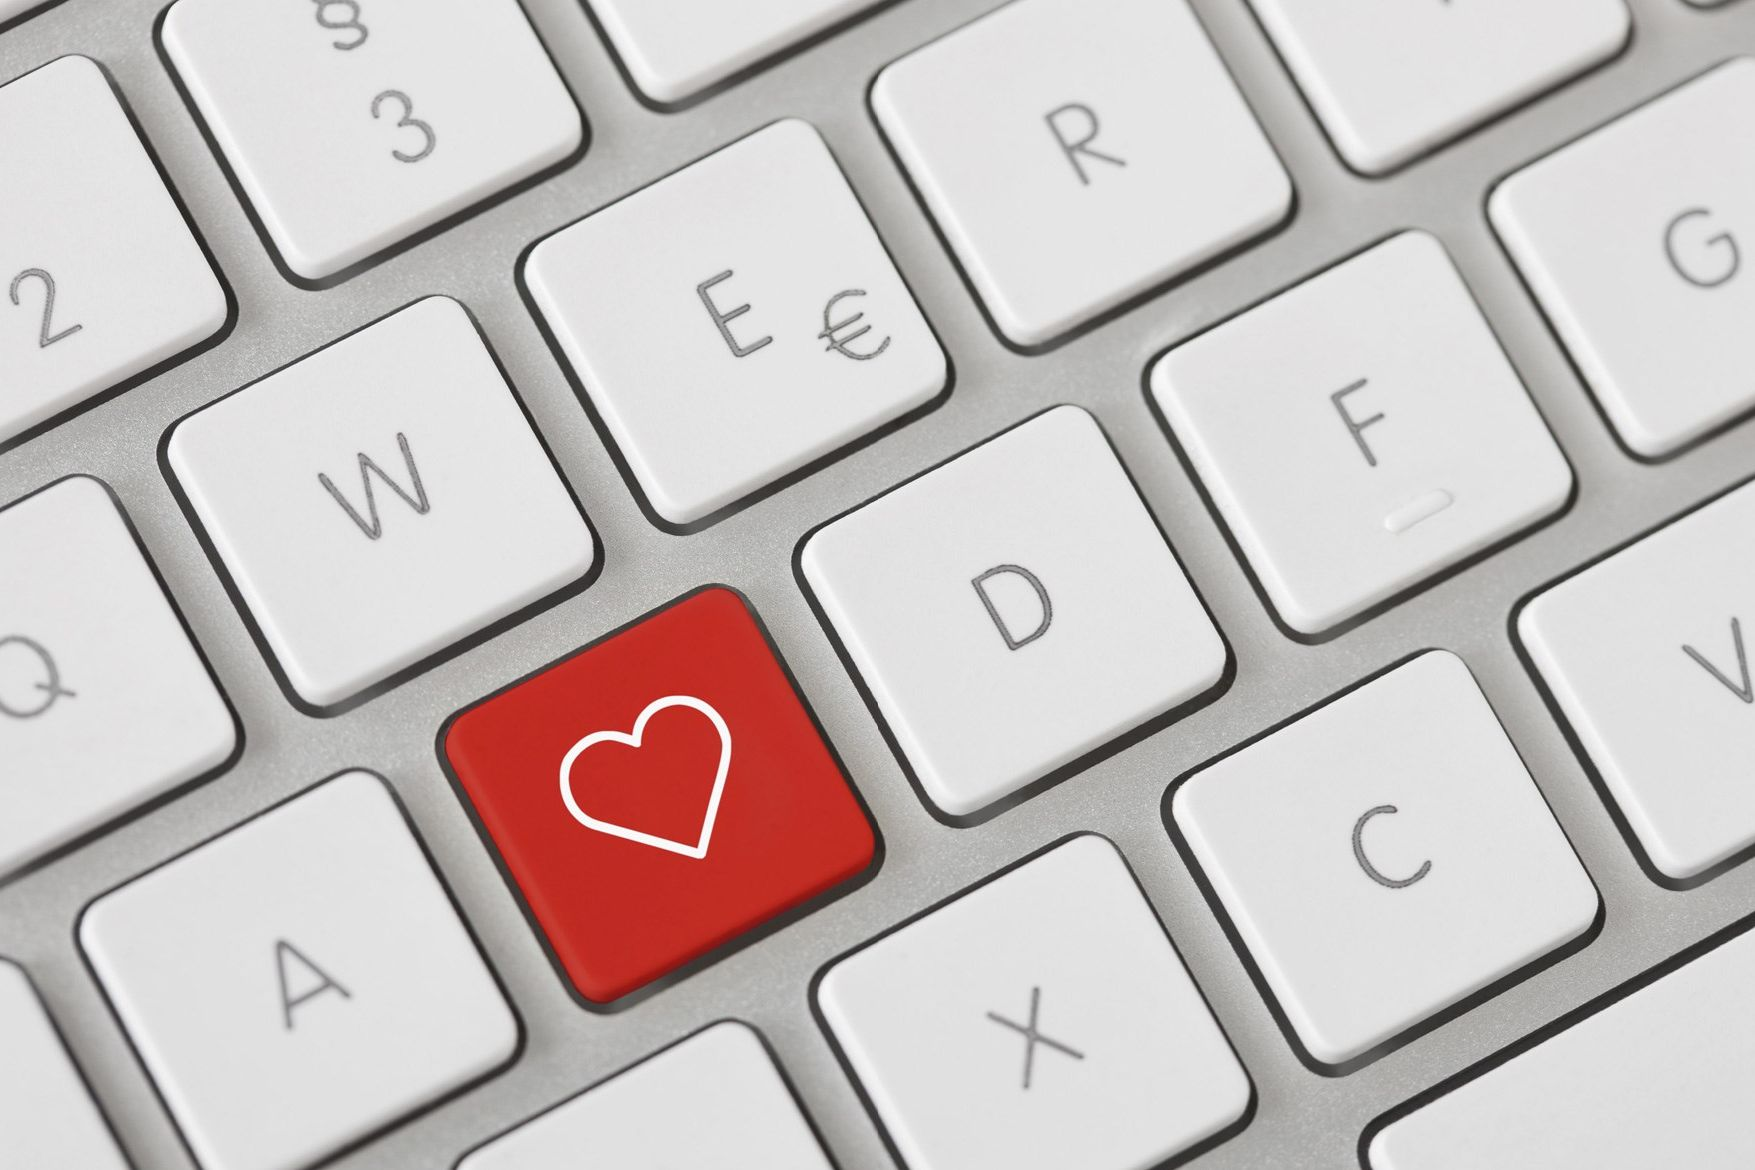 entertainment-2013-03-online-dating-package-dating-headmistress.jpg